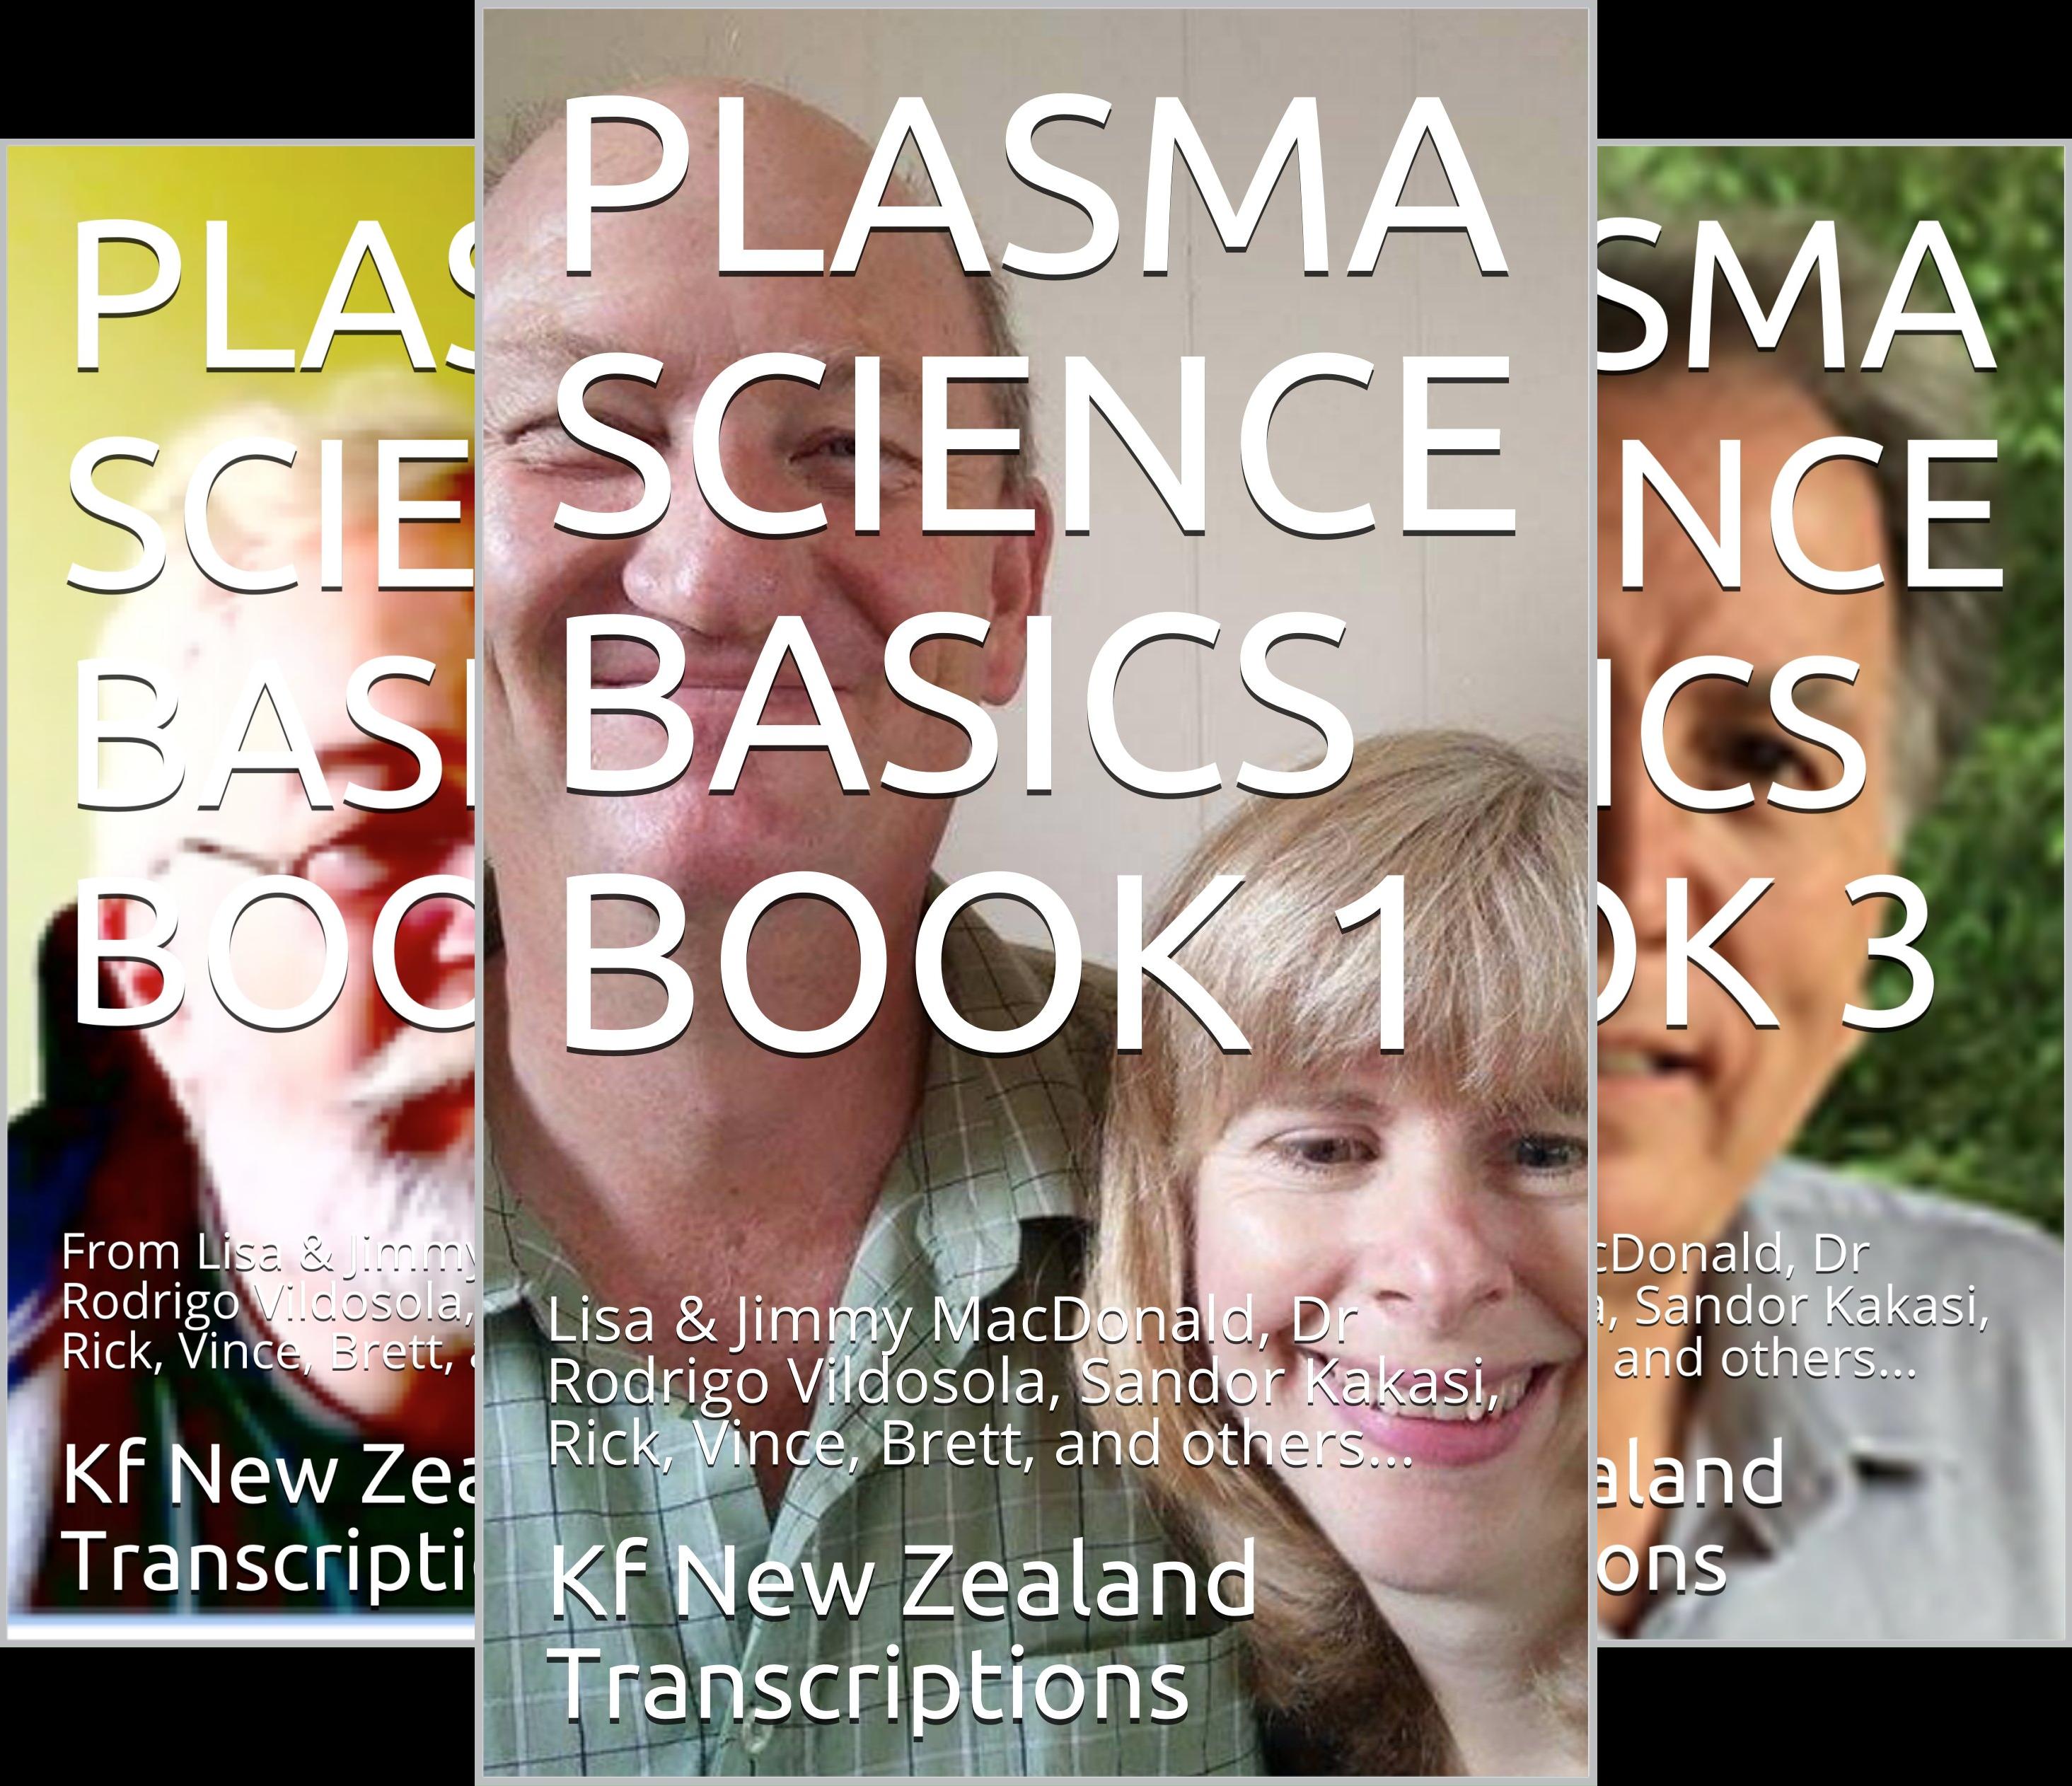 Plasma Science Basics (4 Book Series)